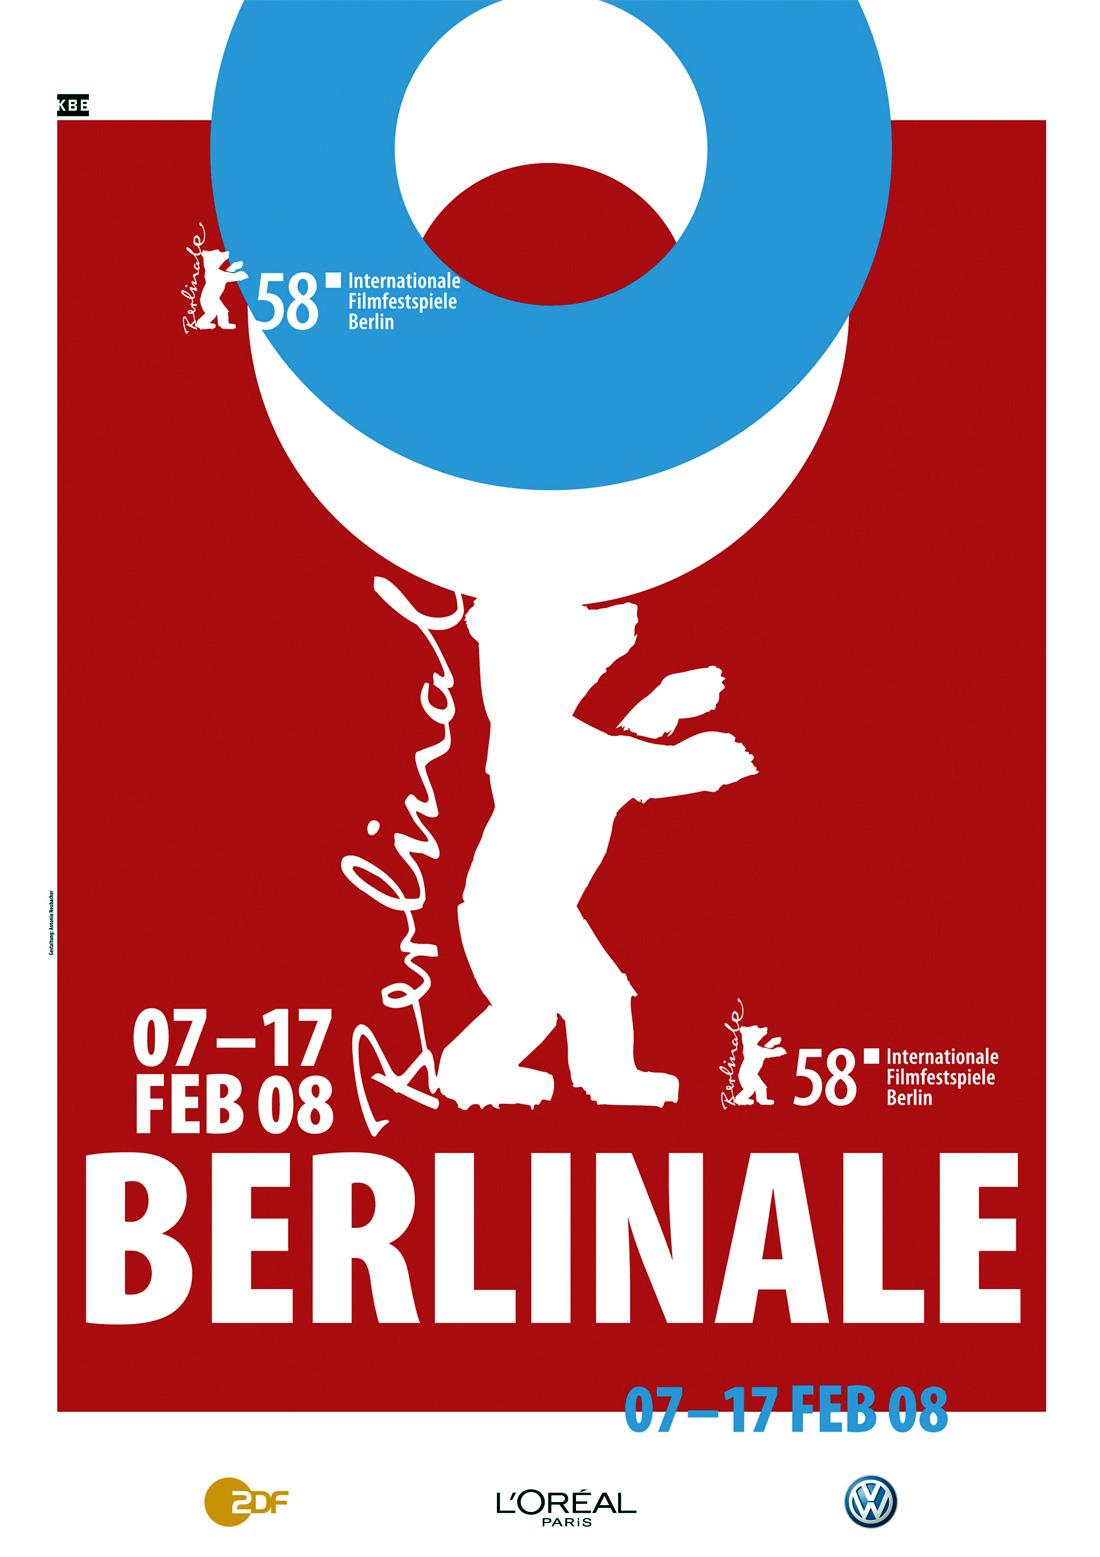 buchstabenplus, 58_berlinale